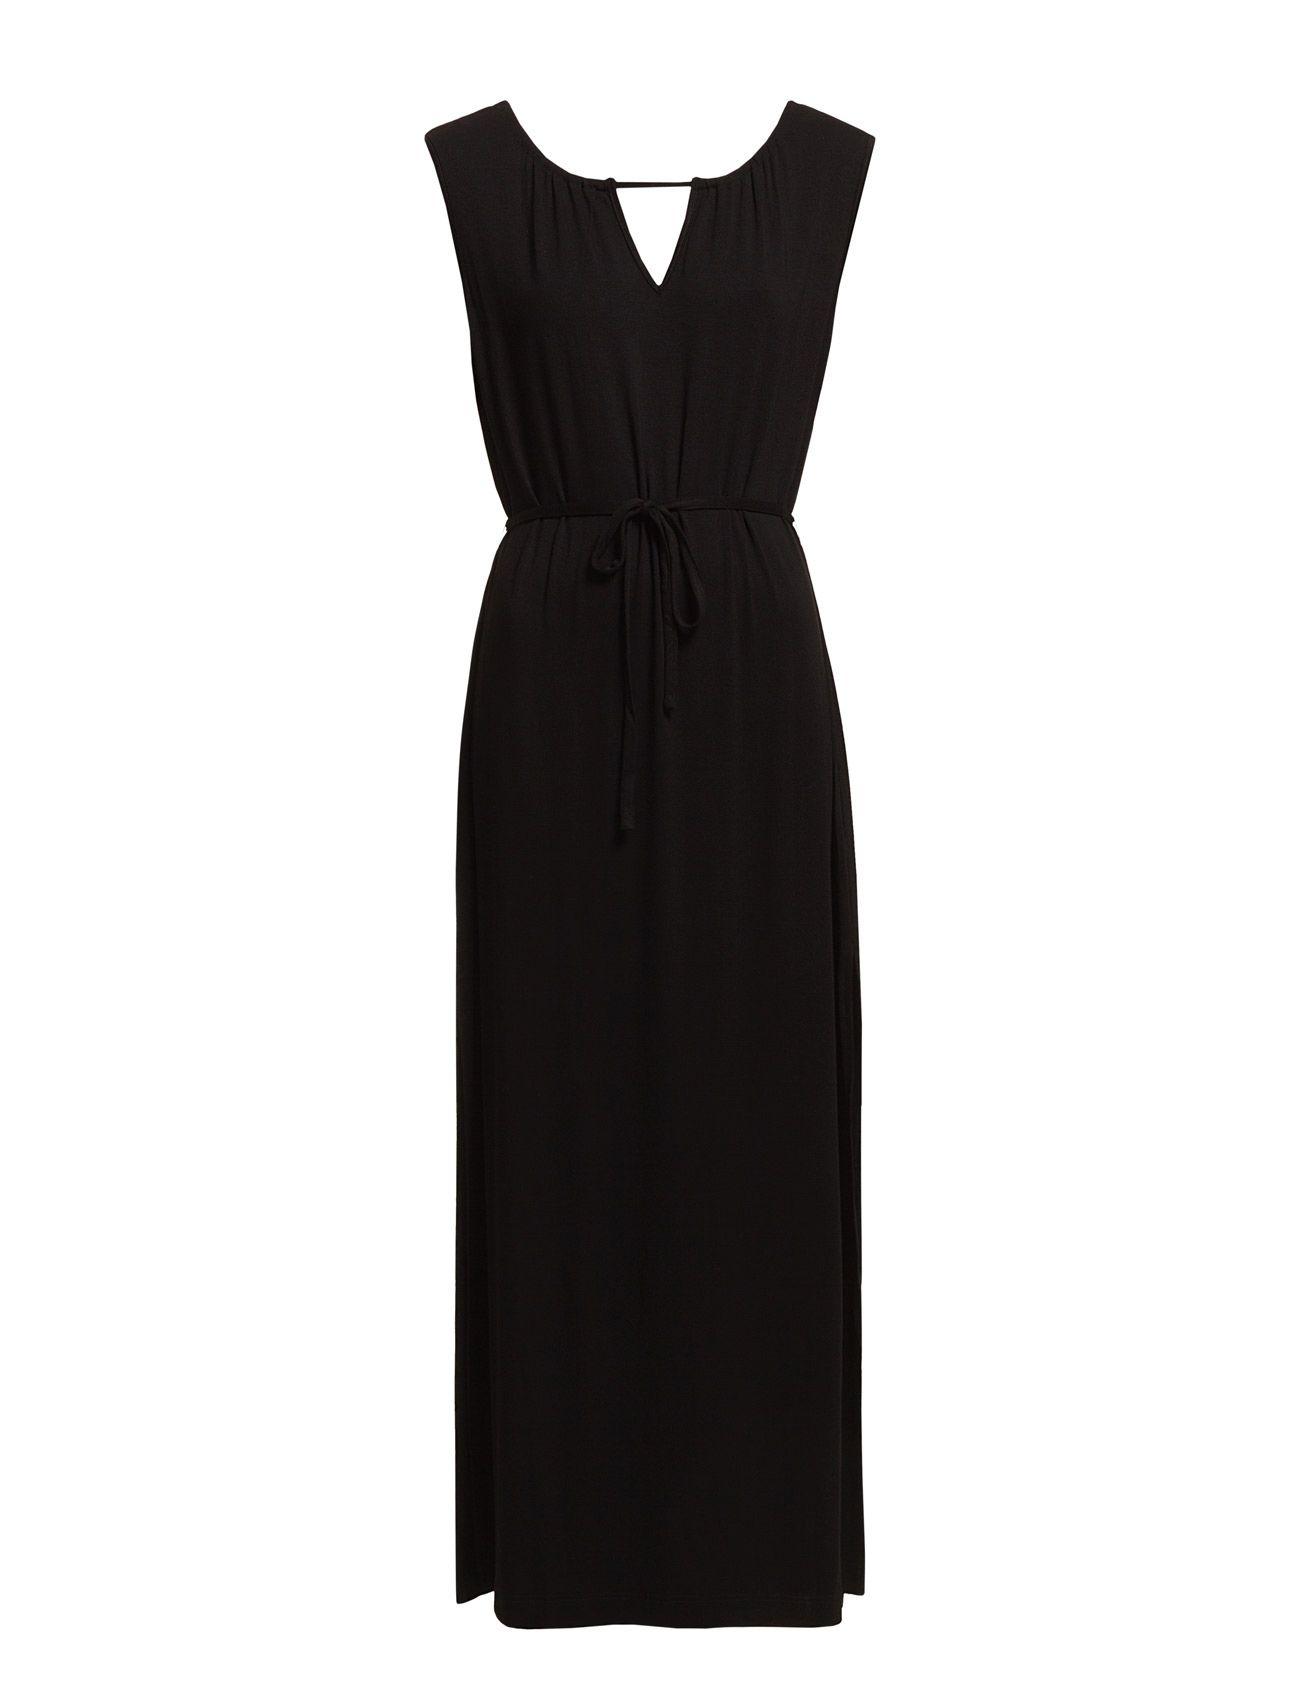 Dry Lake Victoria dress